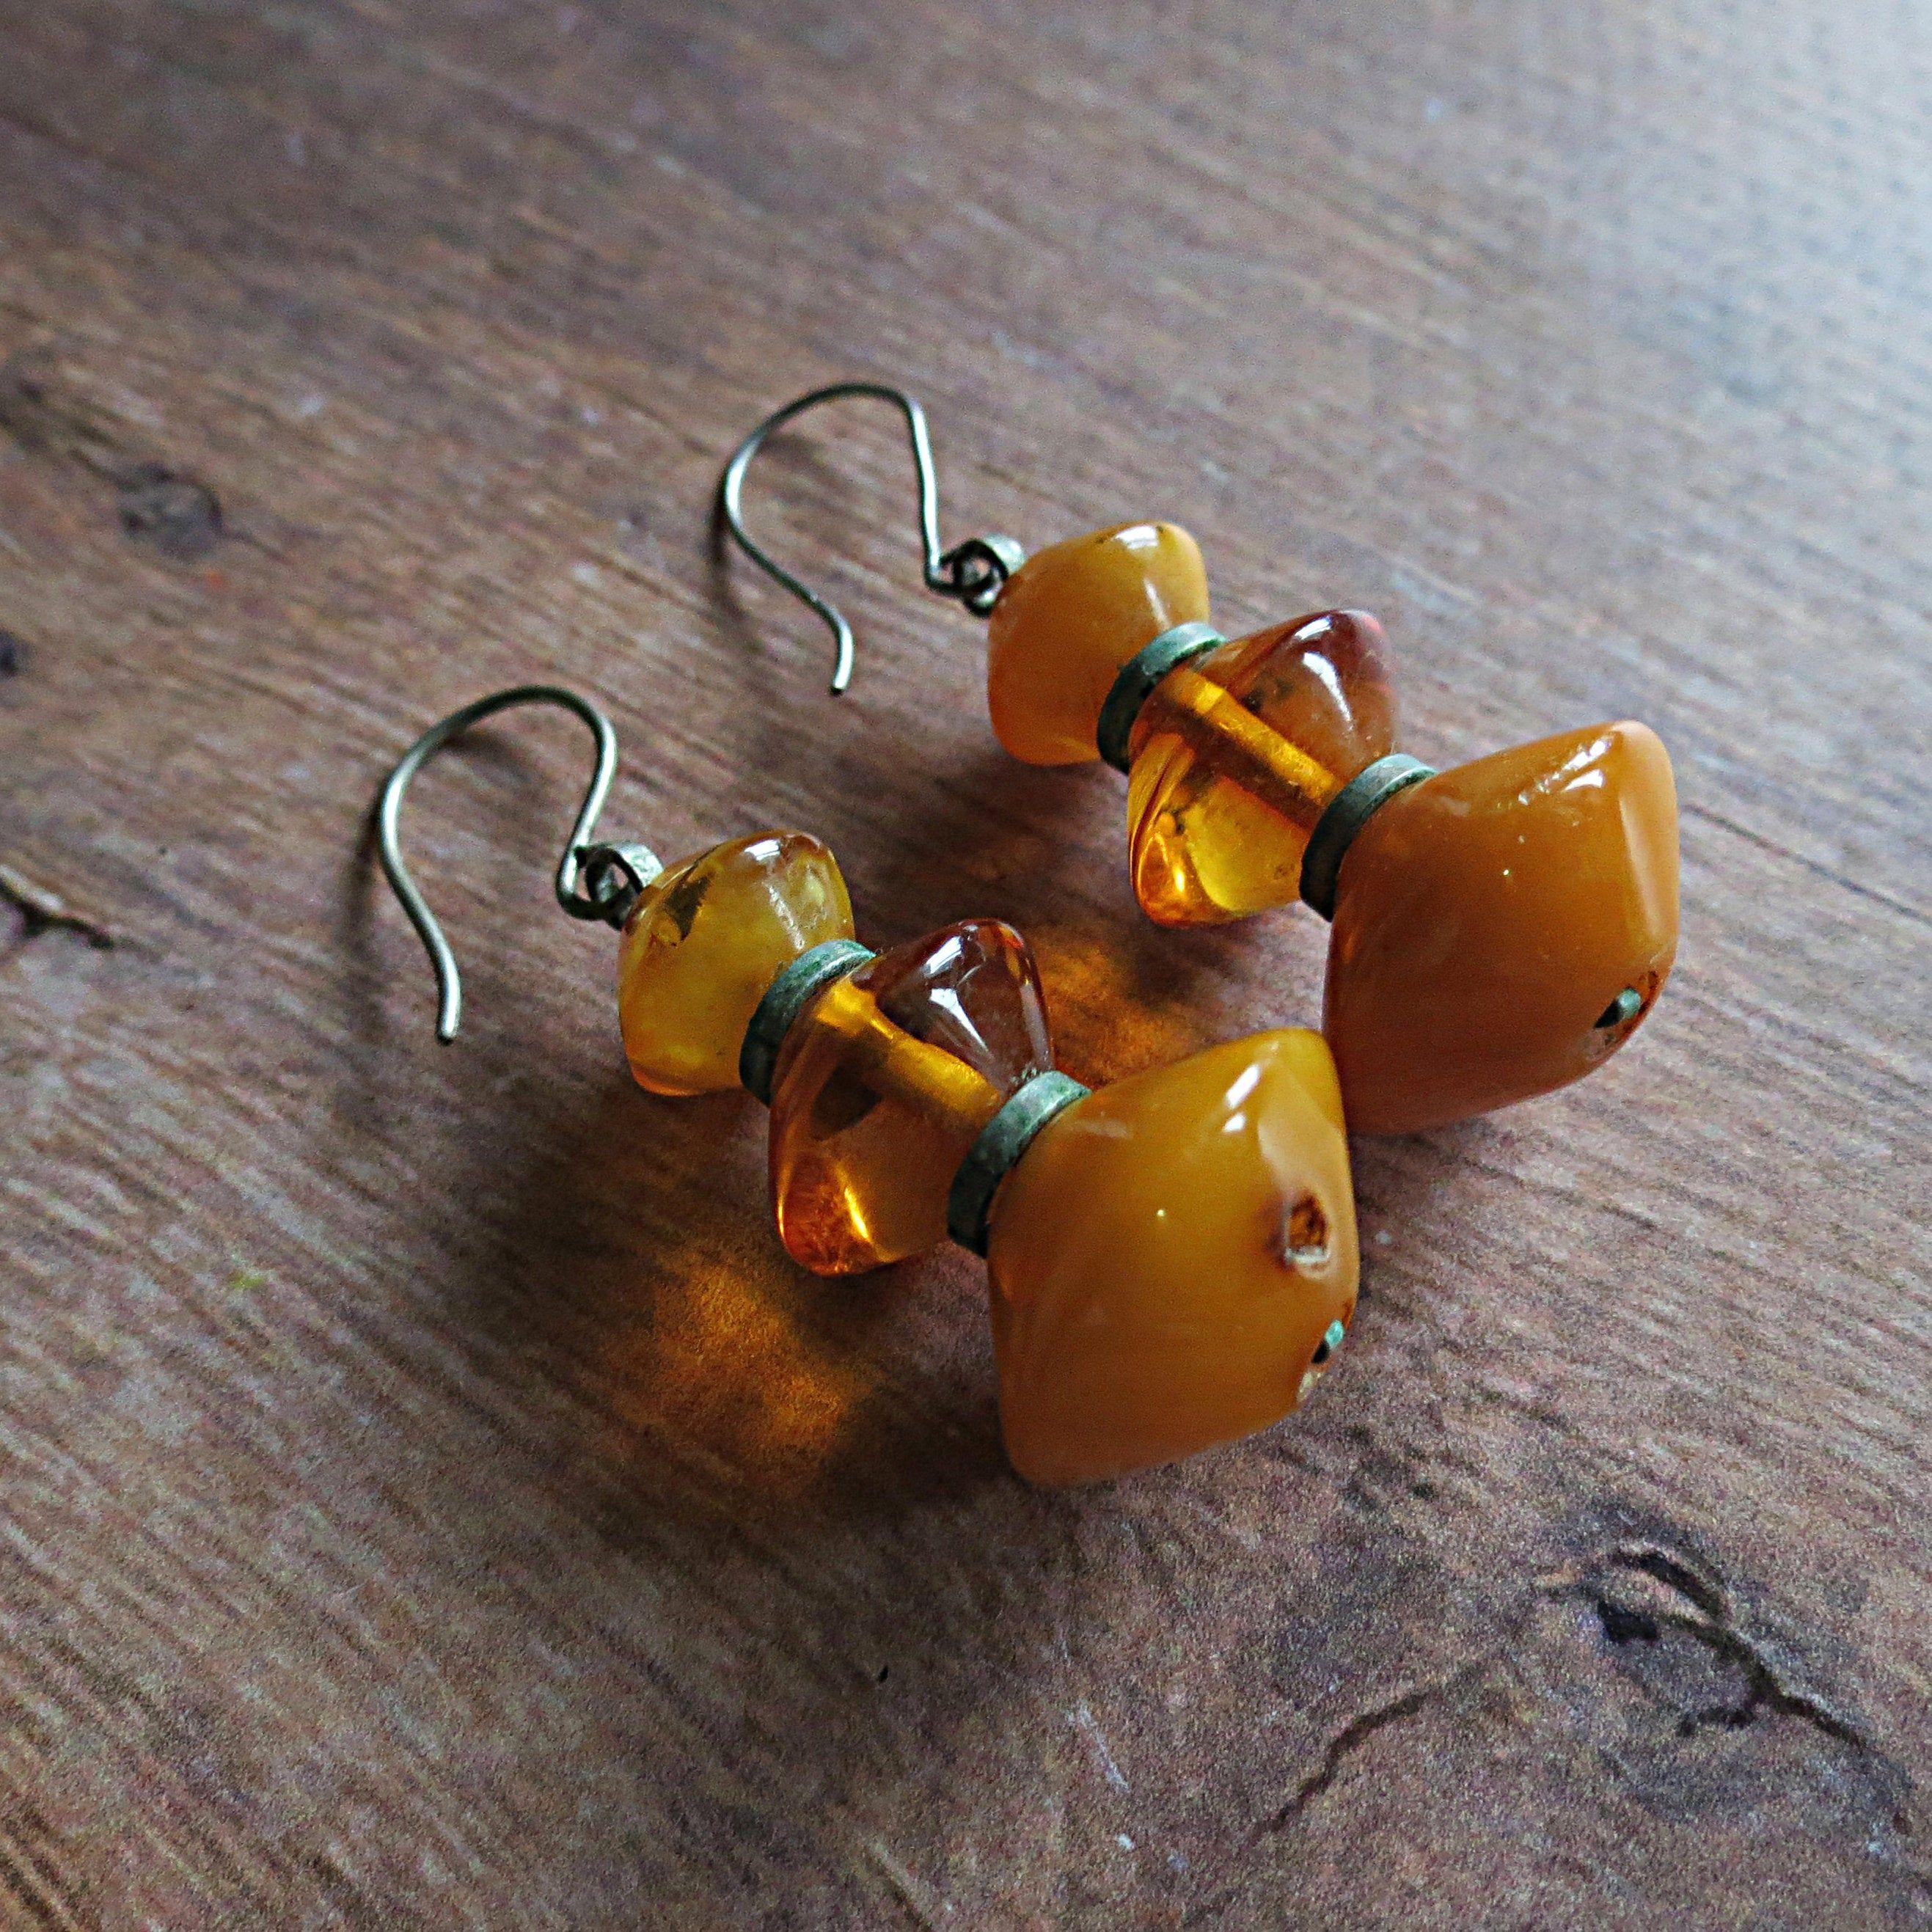 Vintage amber earrings. Genuine baltic amber. Egg yolk, cognac amber. Antique amber earrings. Vintage 1960s. Amber jewelry 1960s. 6,08 gr.